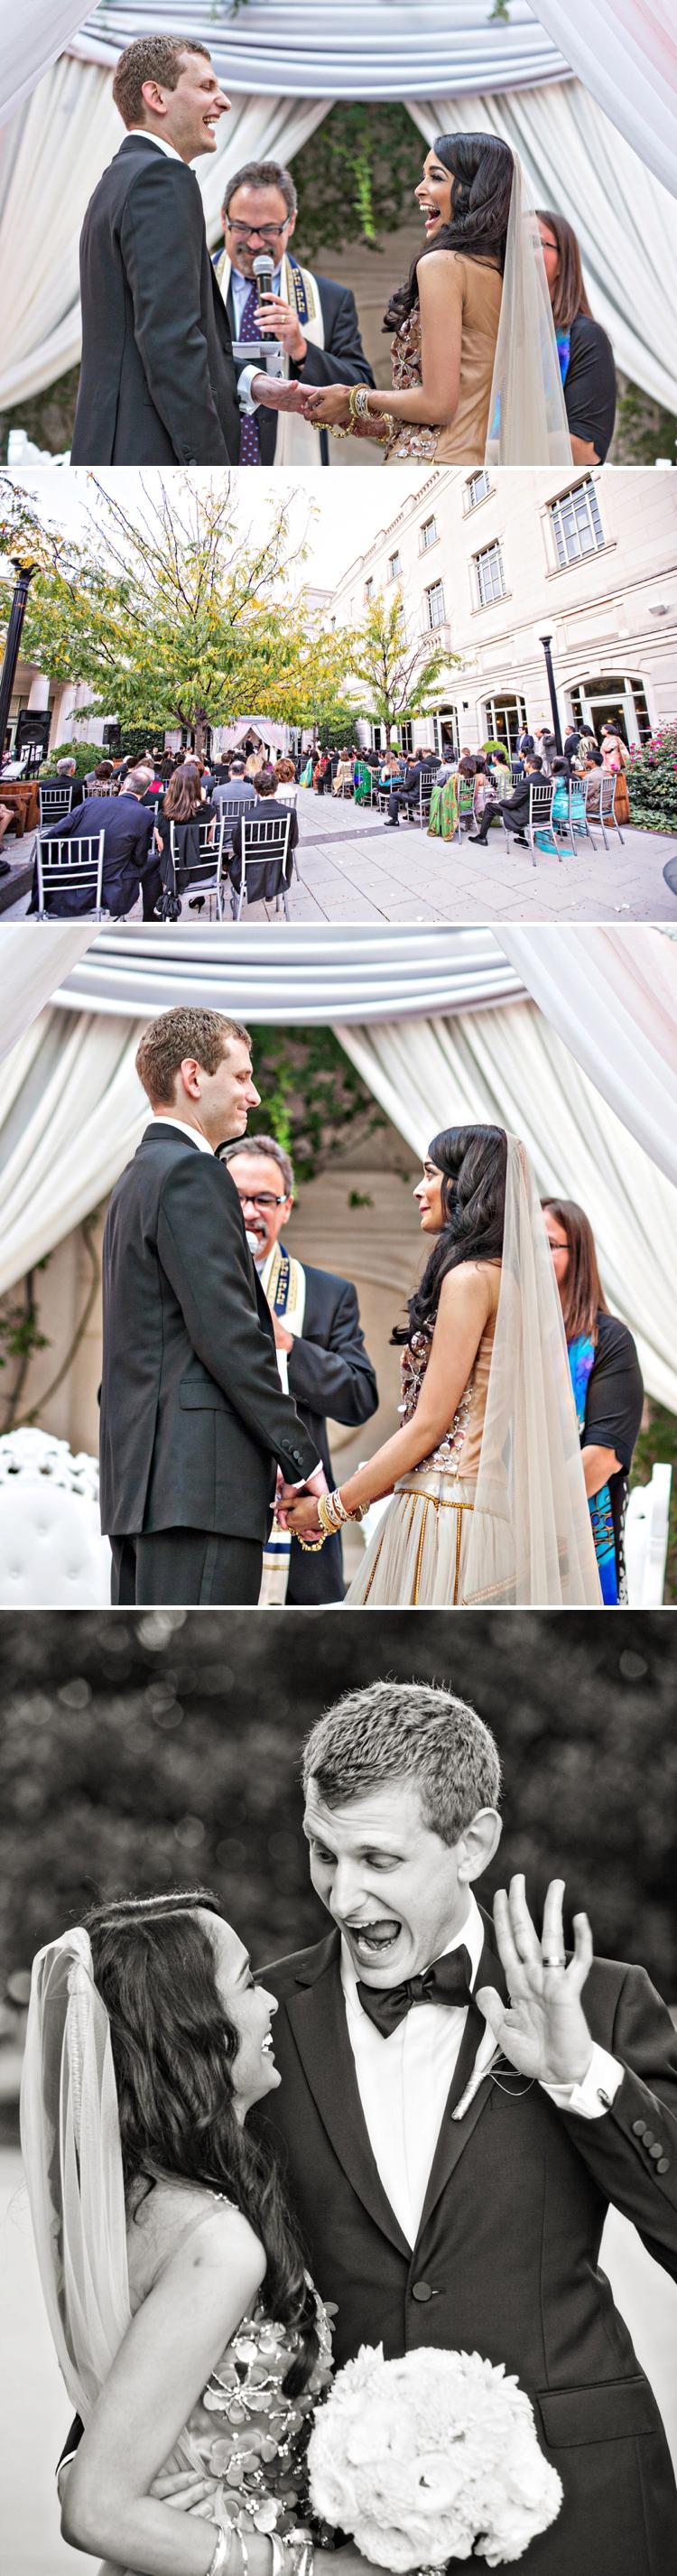 Jewish Muslim Wedding